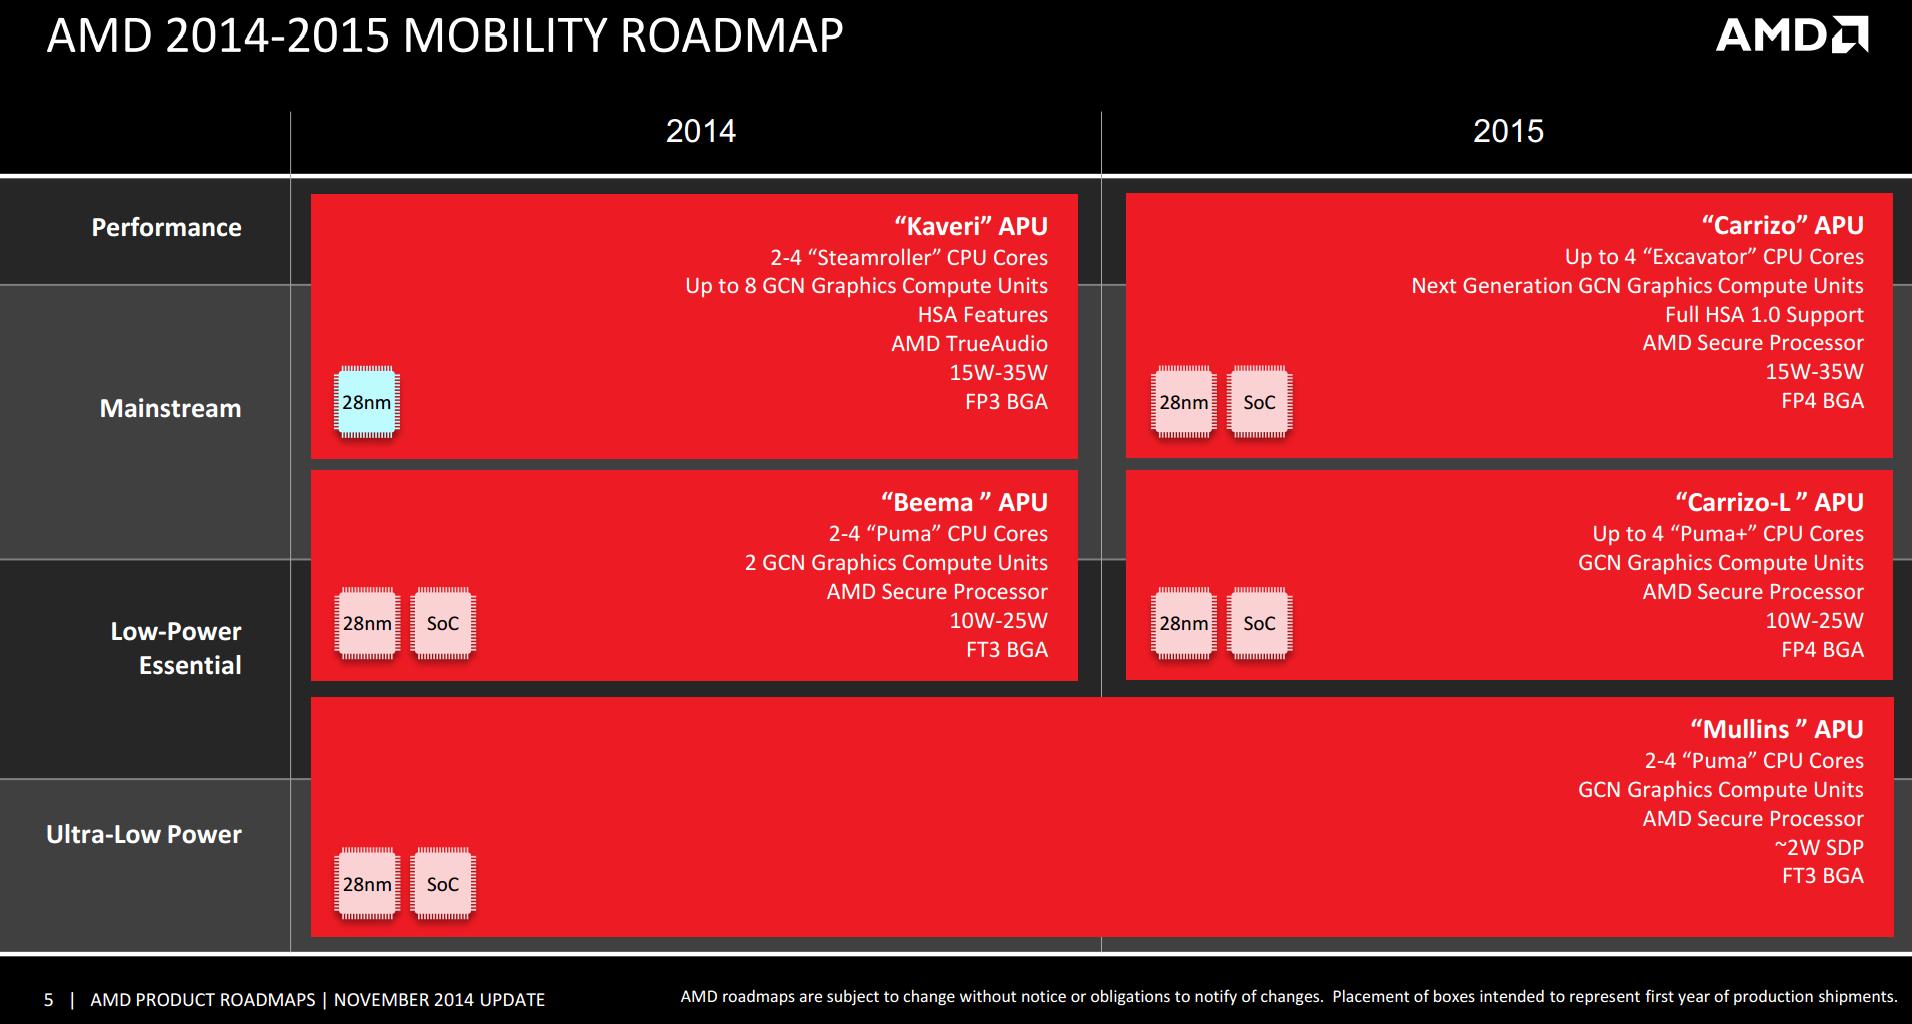 Mobility Roadmap